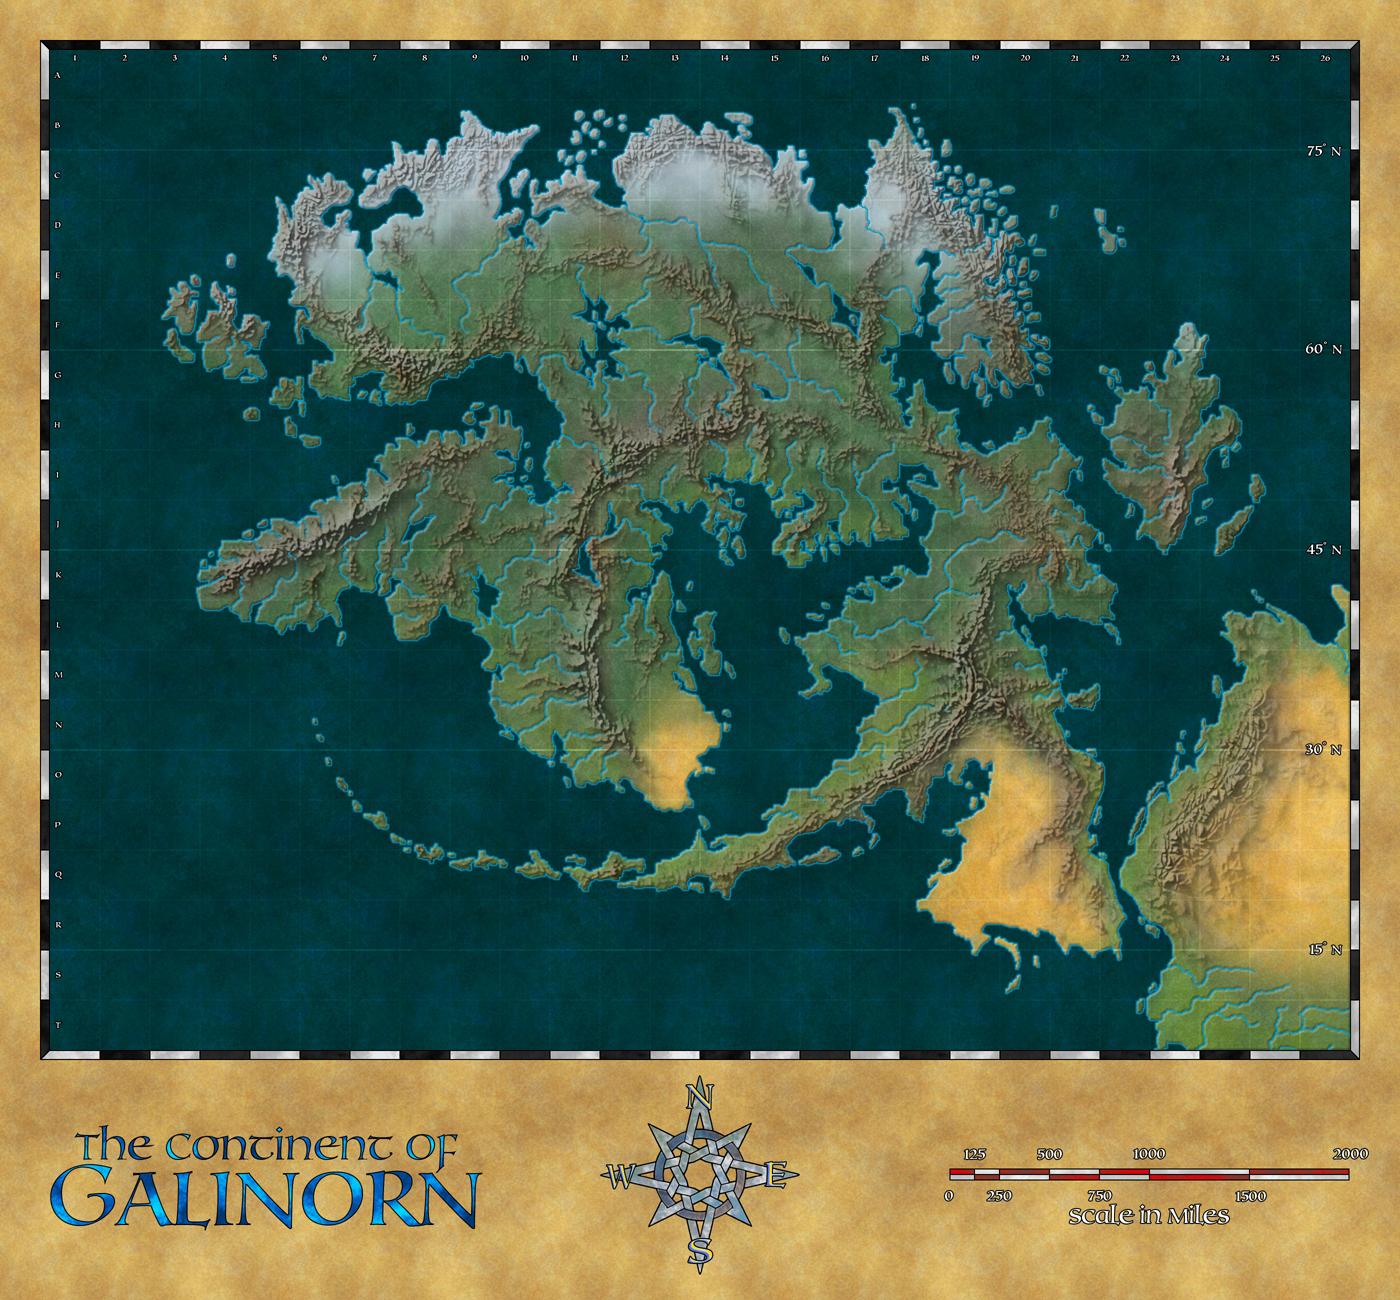 Continent of Galinorn